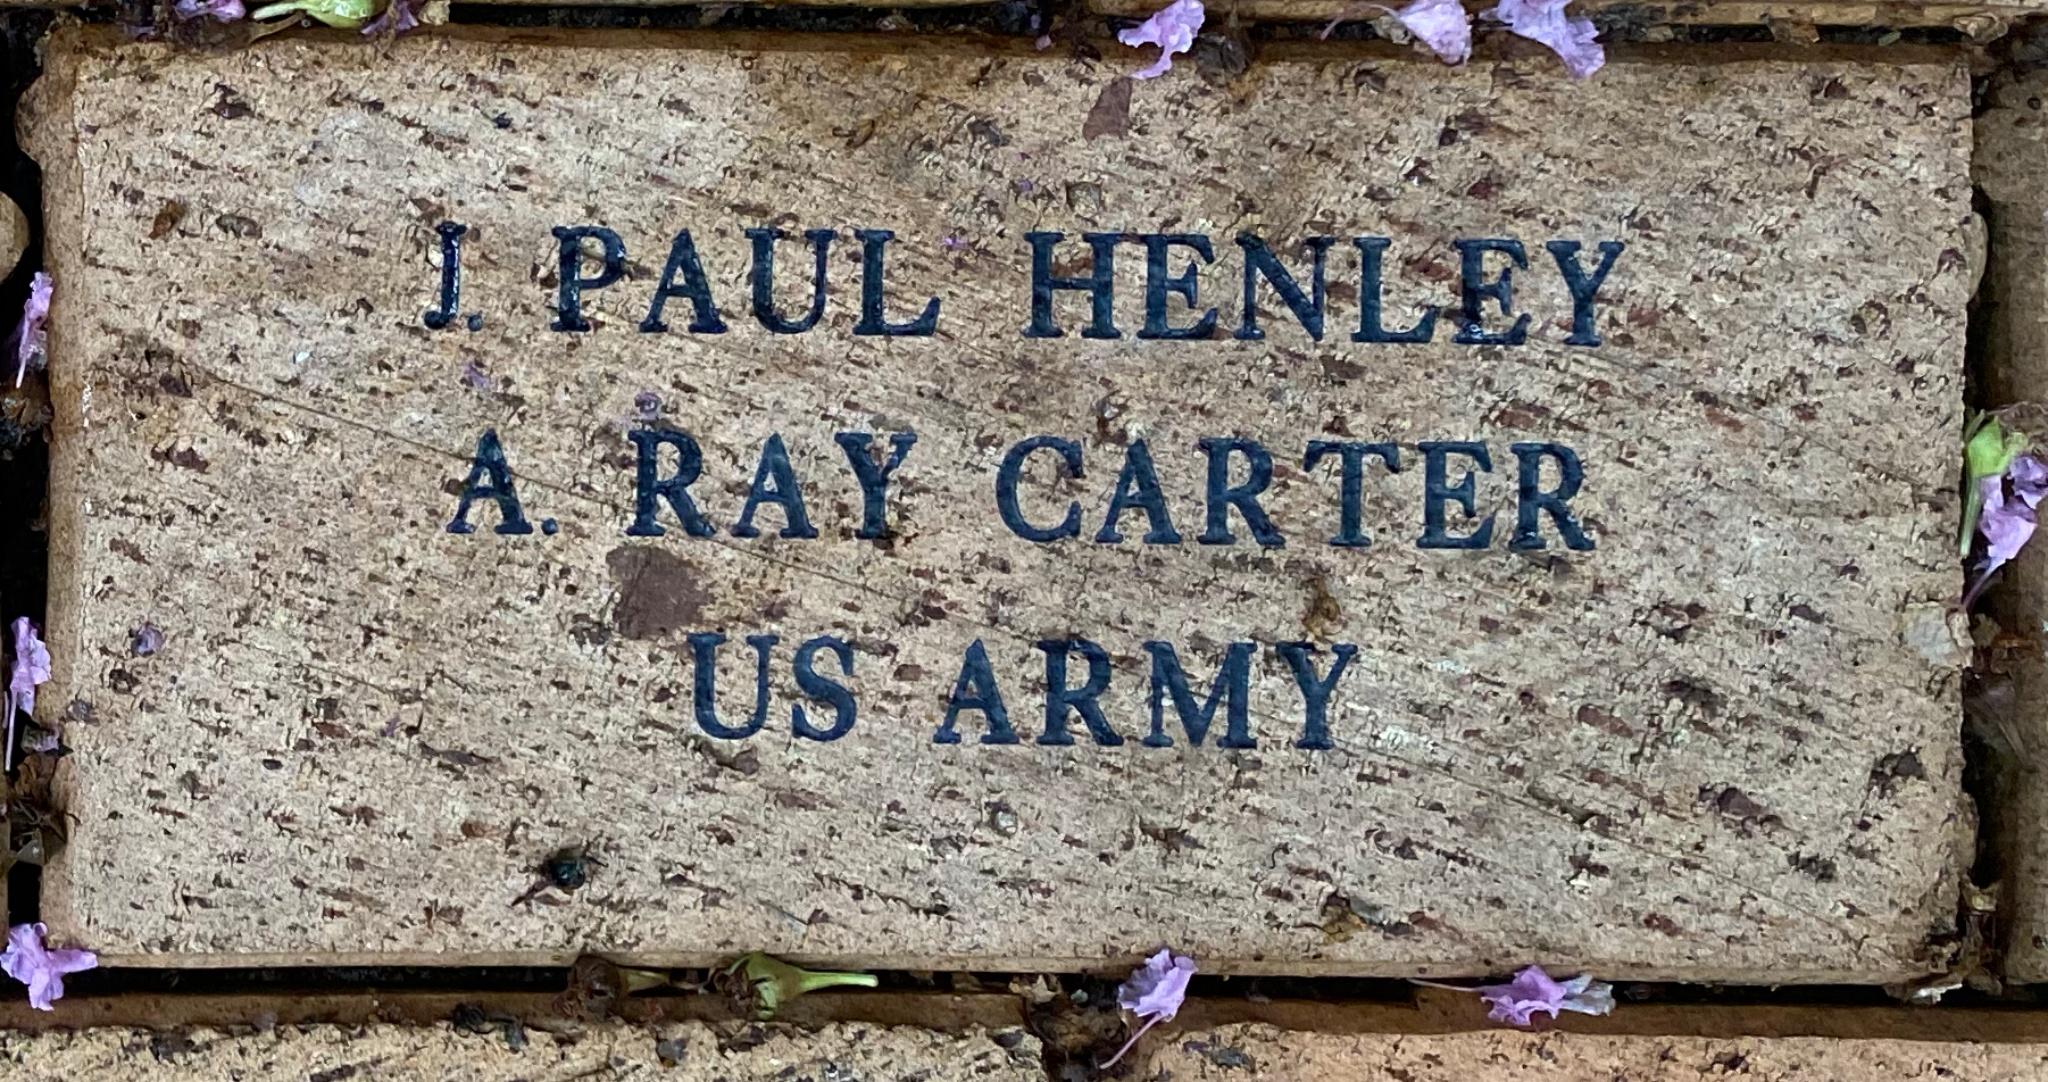 J. PAUL HENLEY A. RAY CARTER U S ARMY